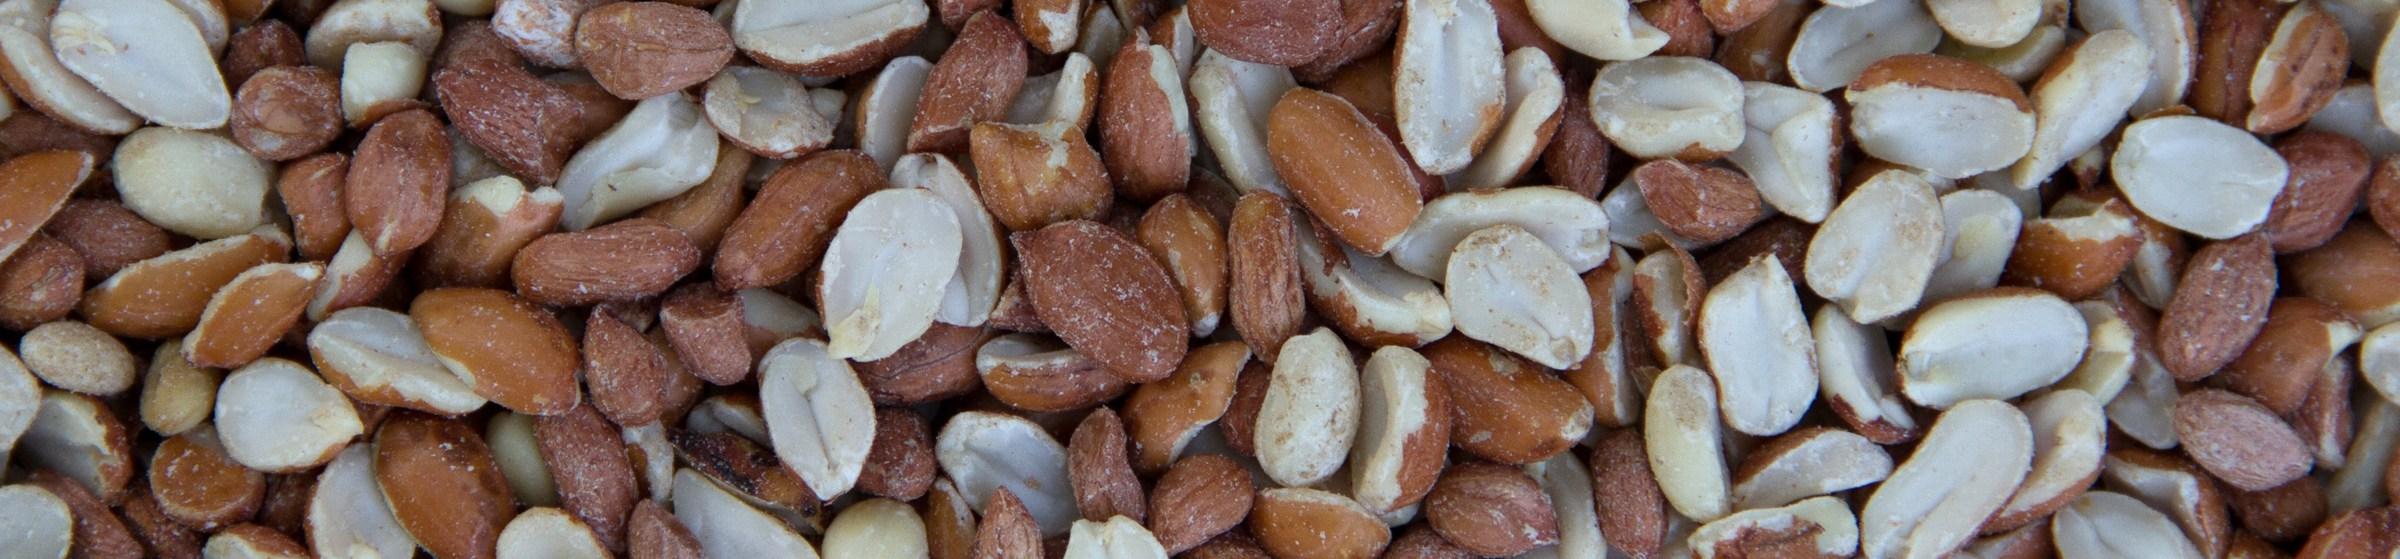 Image of peanut splits wild bird food